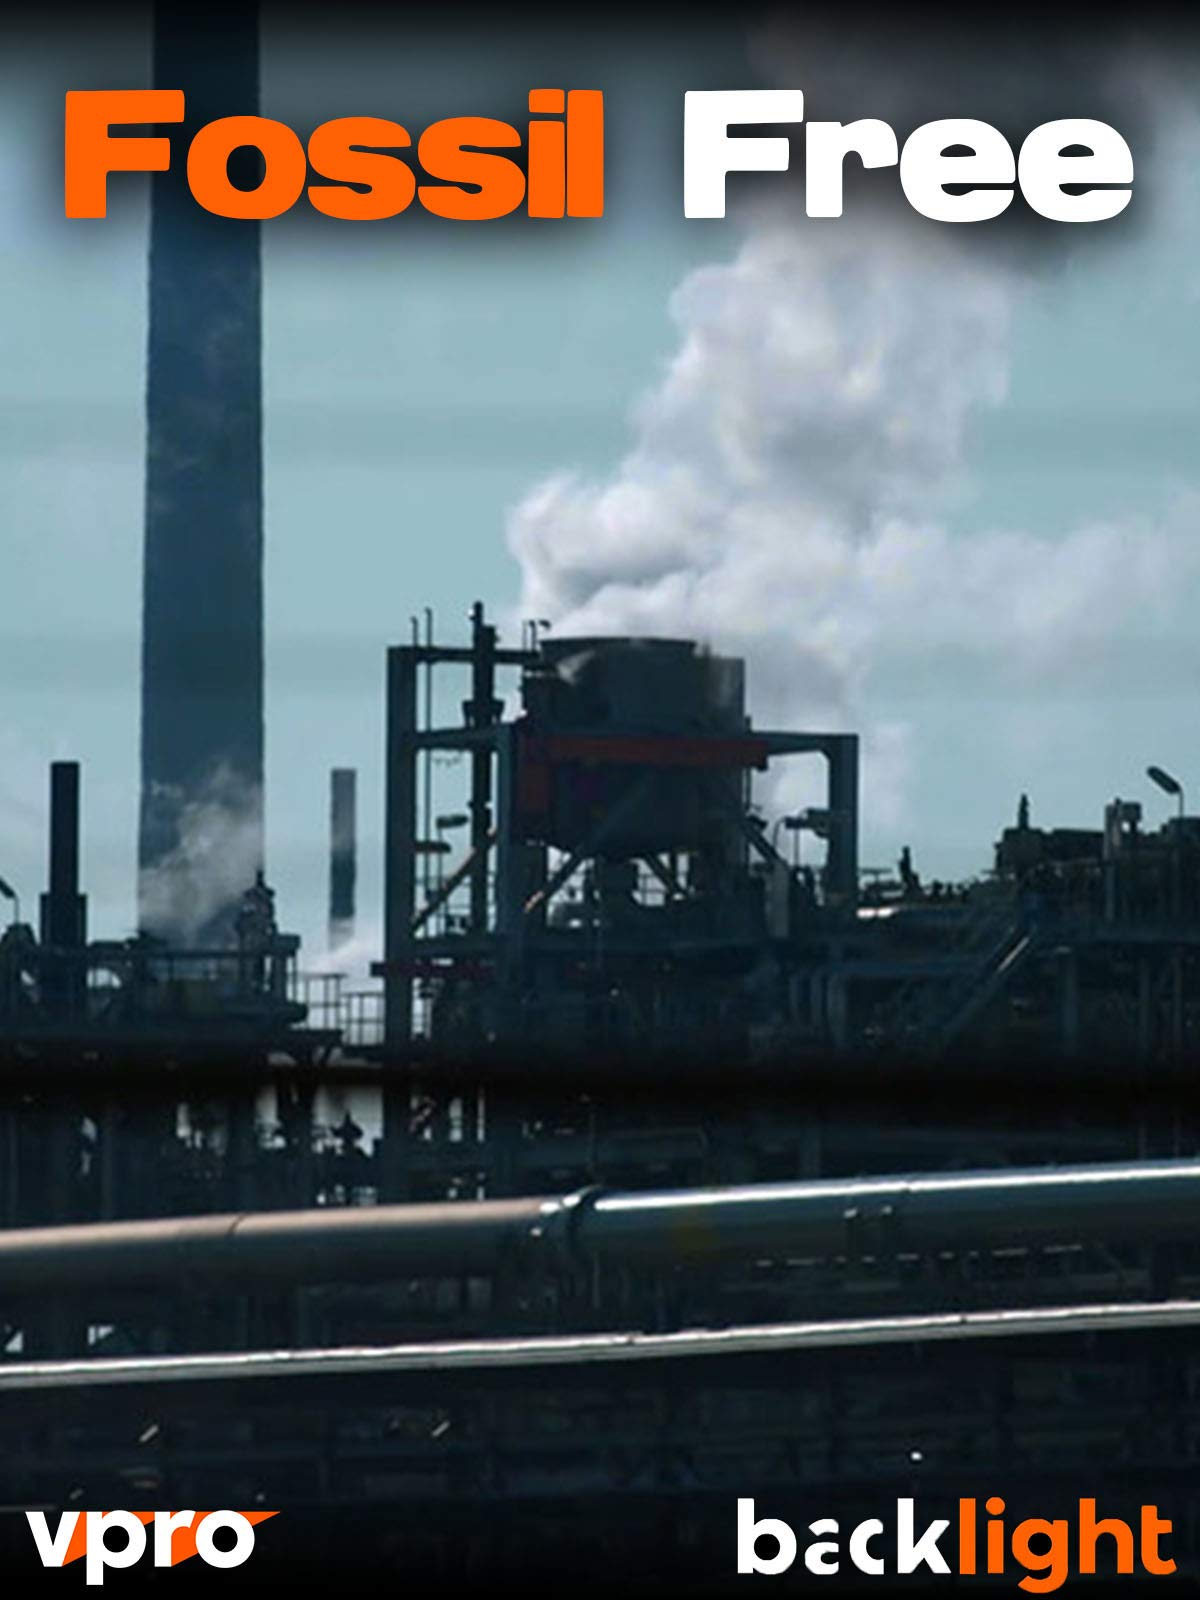 Fossil Free - VPRO Backlight on Amazon Prime Video UK